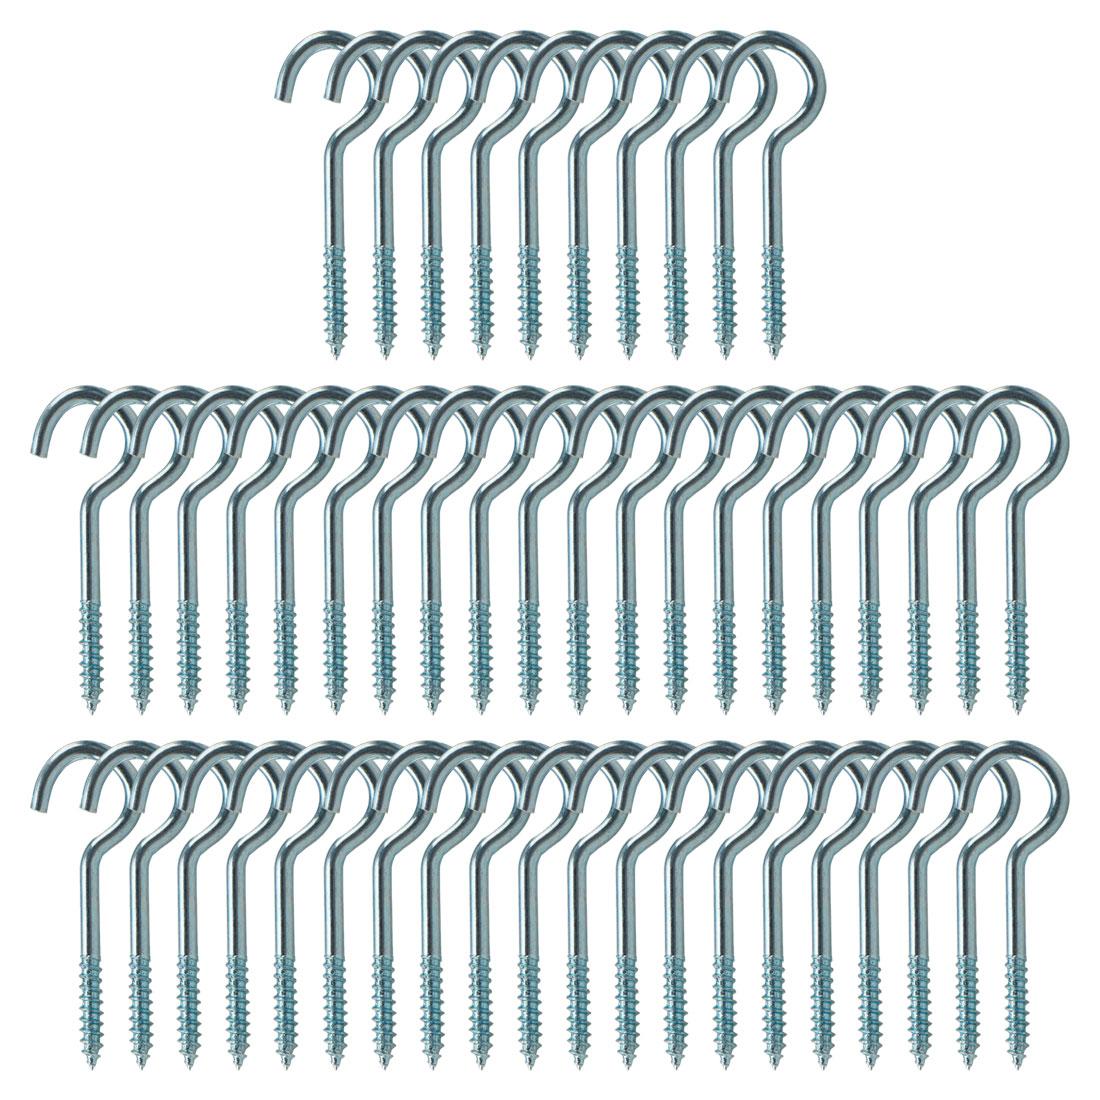 50pcs Cup Ceiling Hooks 1-1/4 Inch Durable Metal Screw in Hanger Hooks Blue